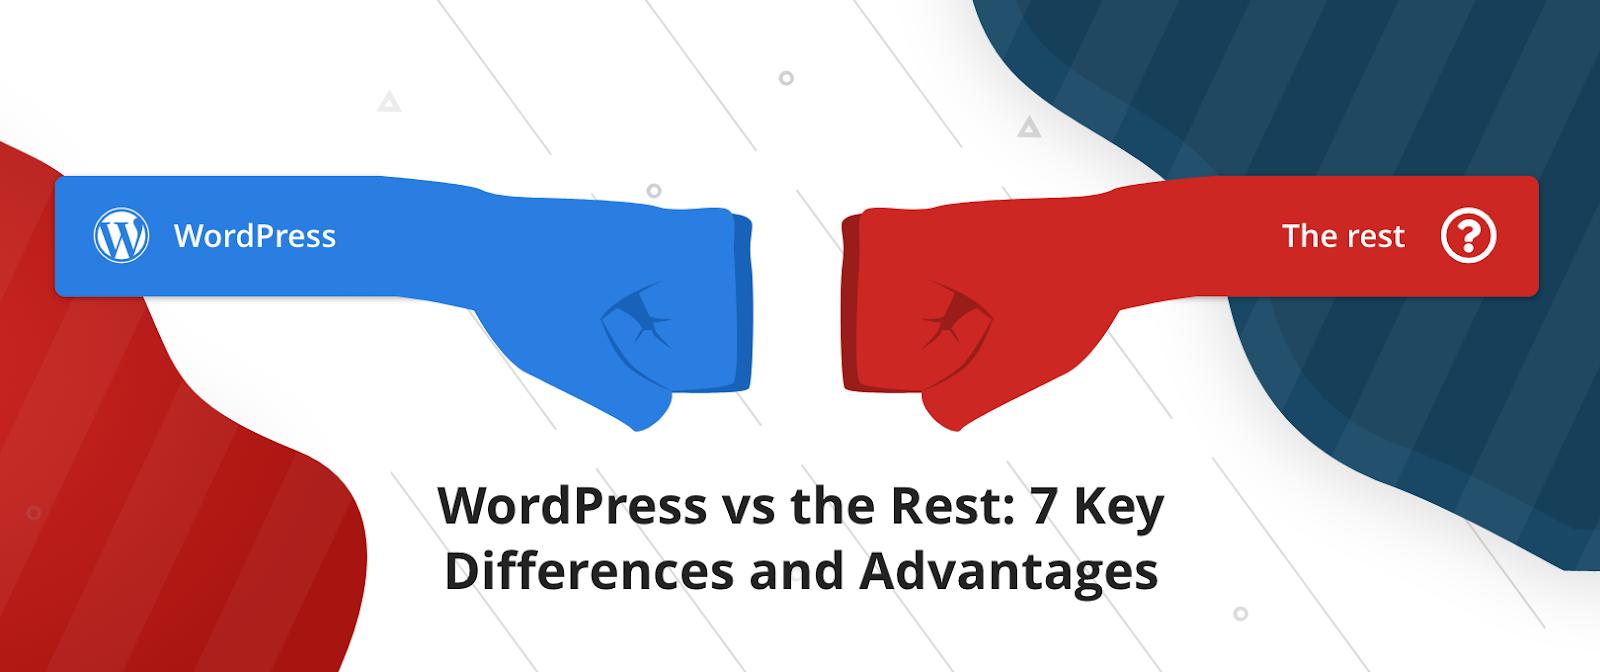 WordPress vs the rest